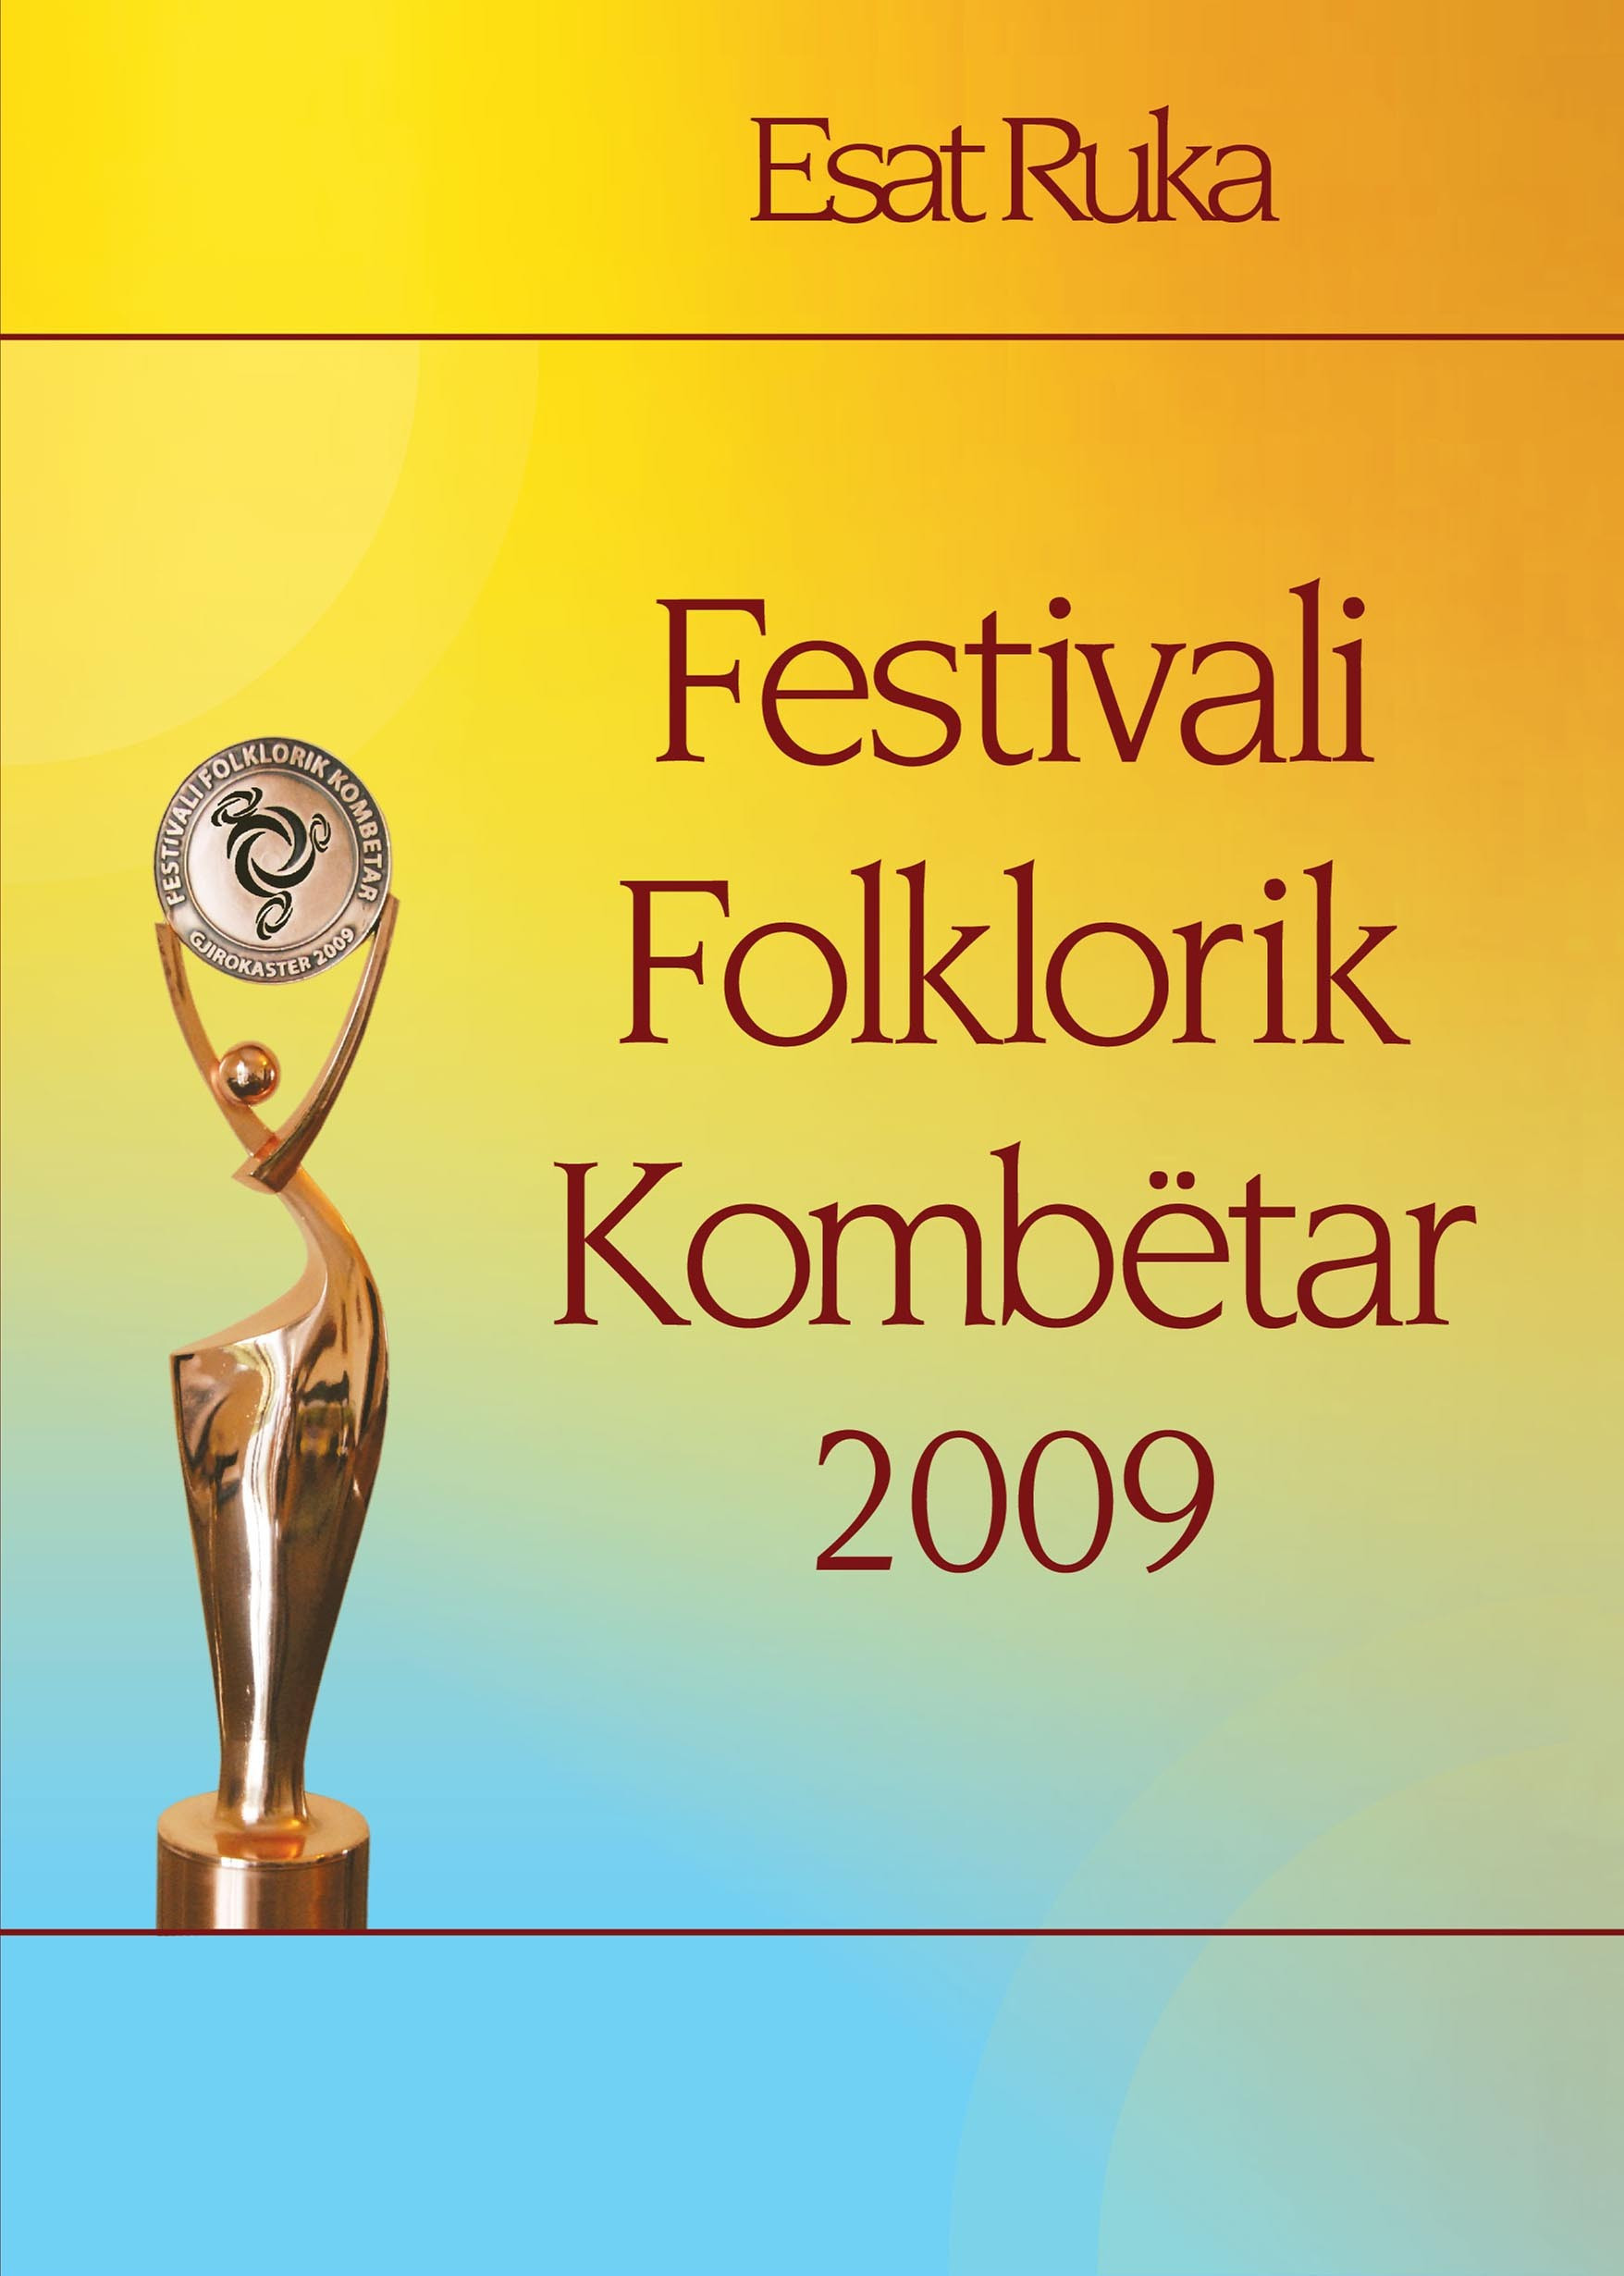 Festivali Folklorik Kombëtar (24-29 shtator, Gjirokastër 2009)